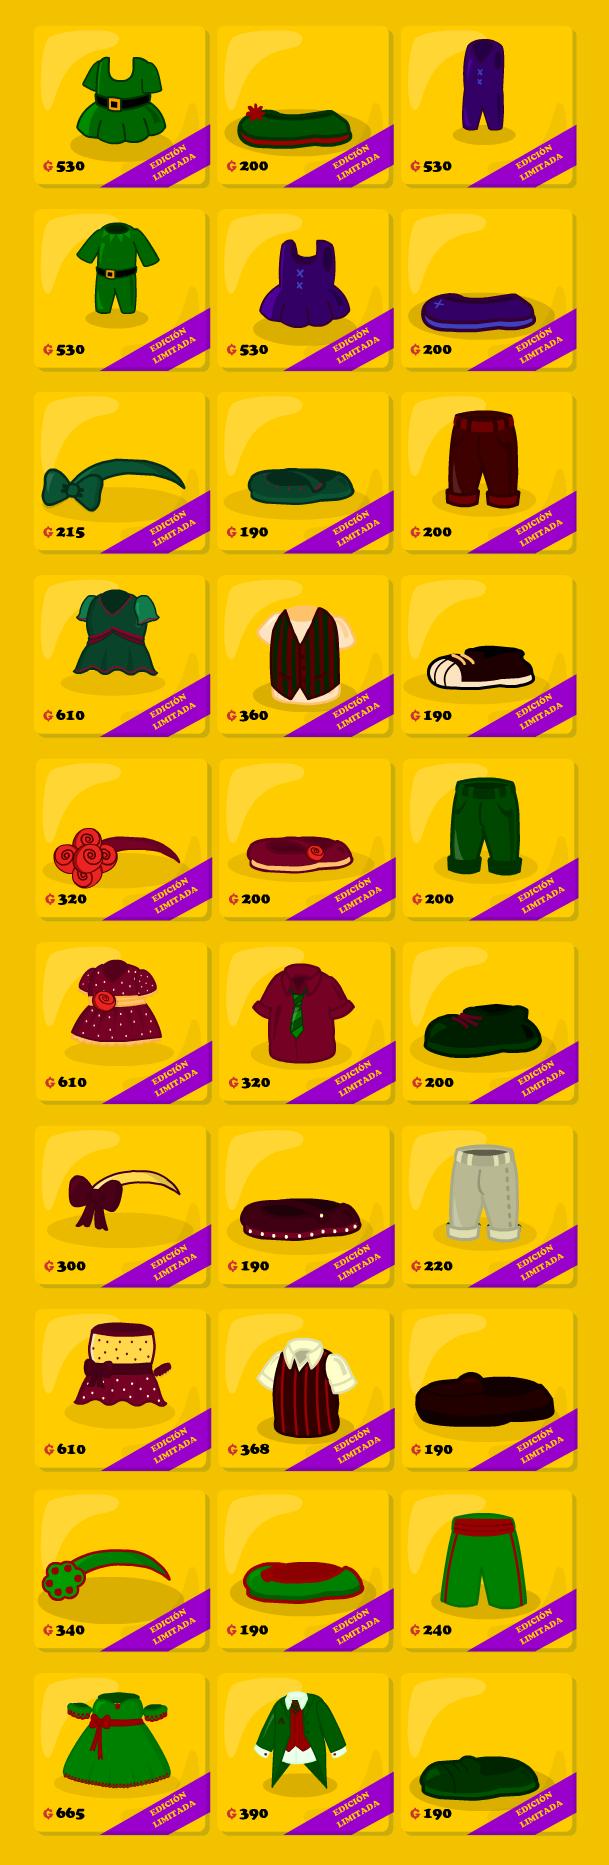 Catálogo de Navidad 2012